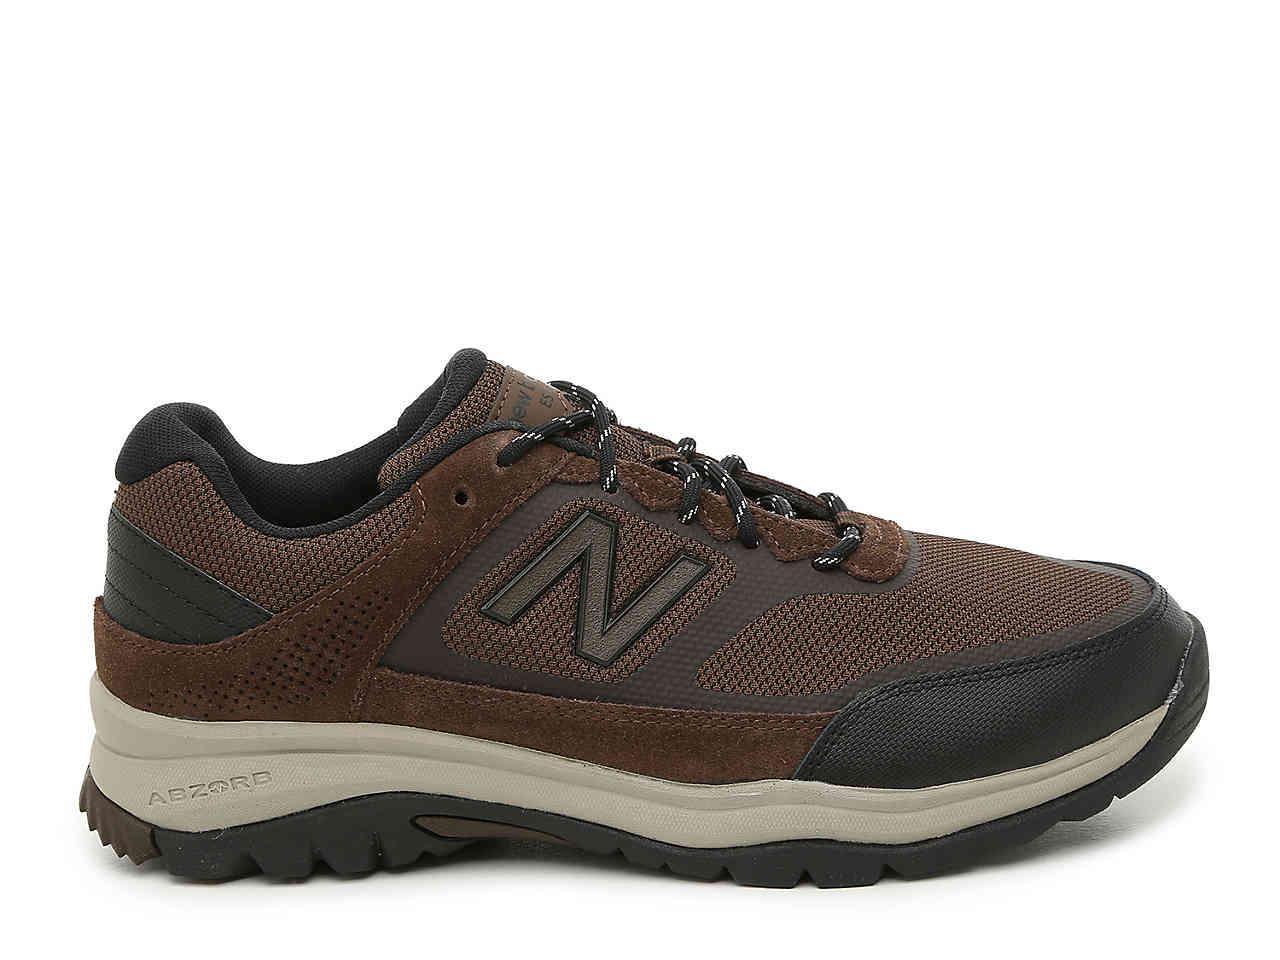 New Balance Suede Mw669v1 Walking Shoe